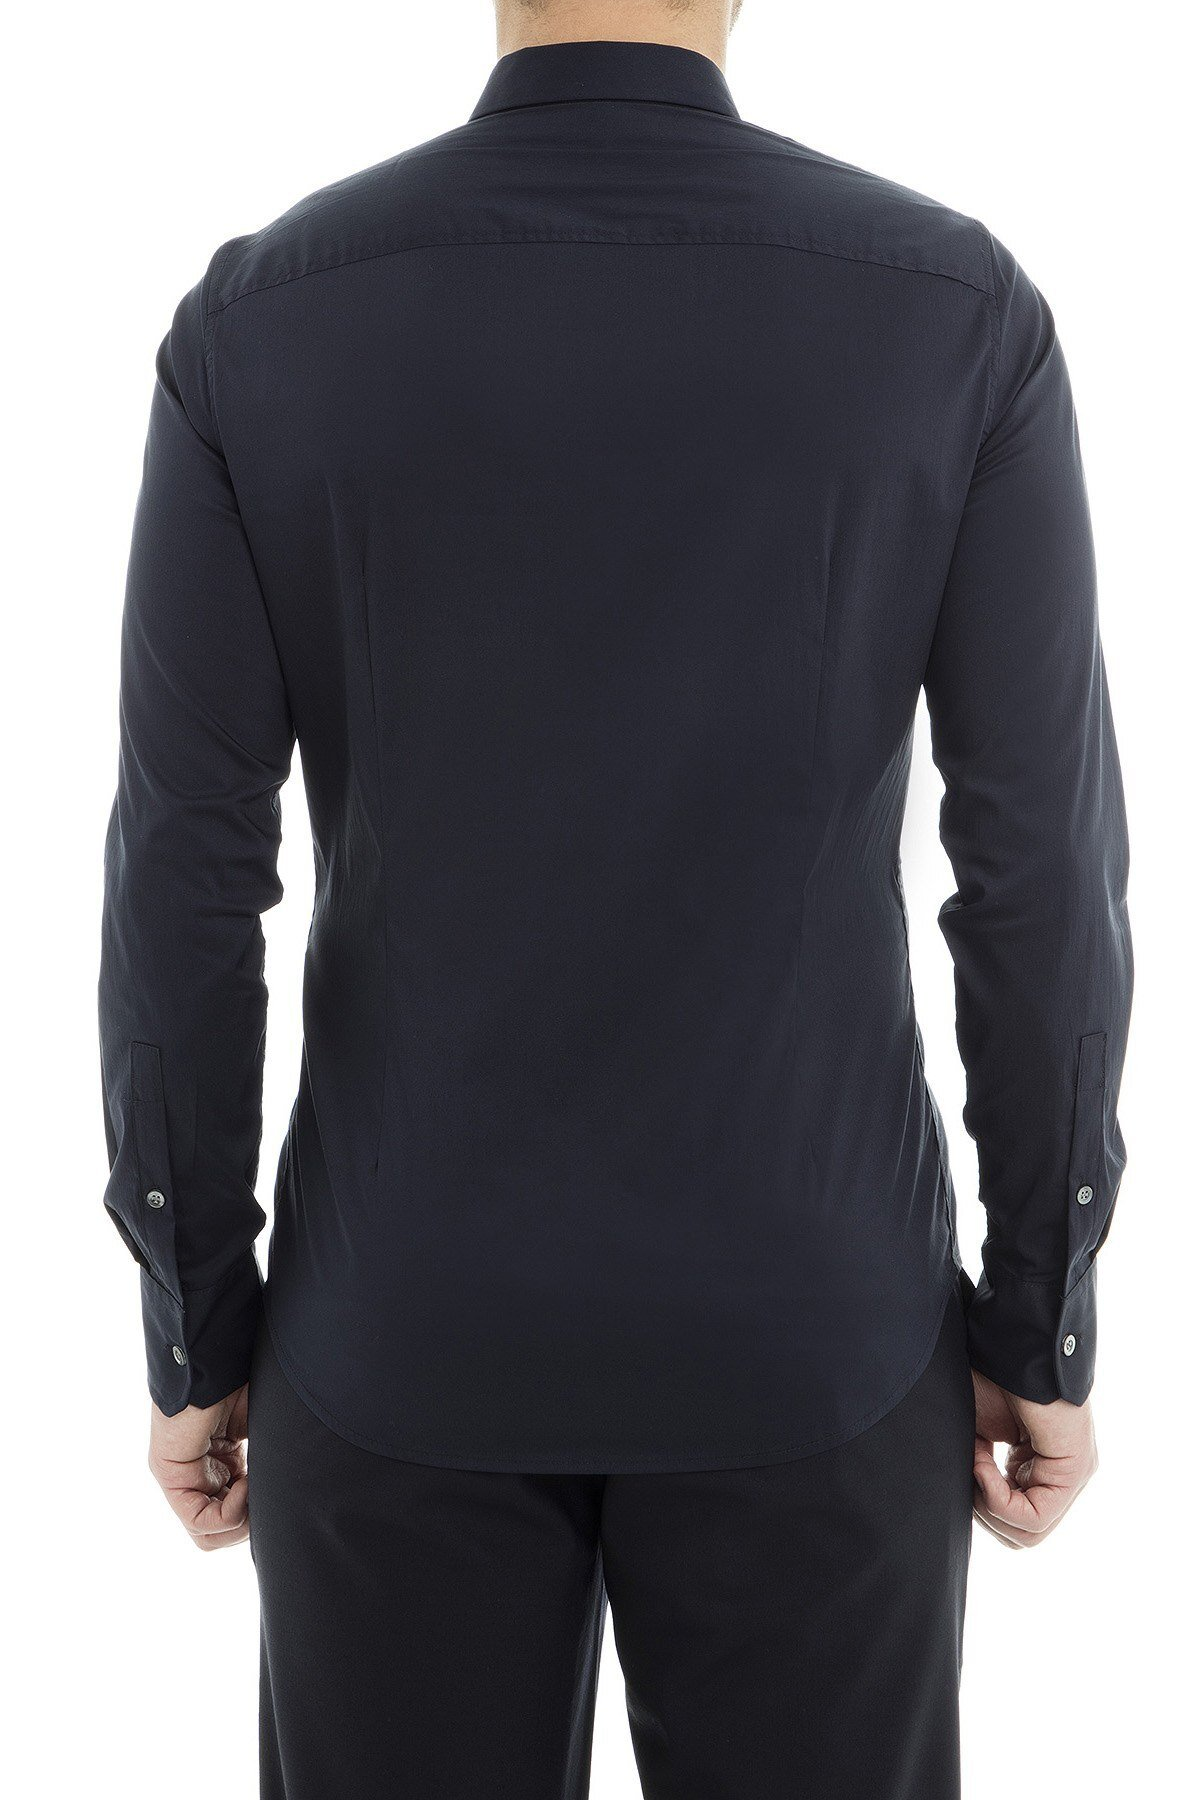 Emporio Armani Erkek Gömlek 3G1CL4 1NHUZ 0920 LACİVERT